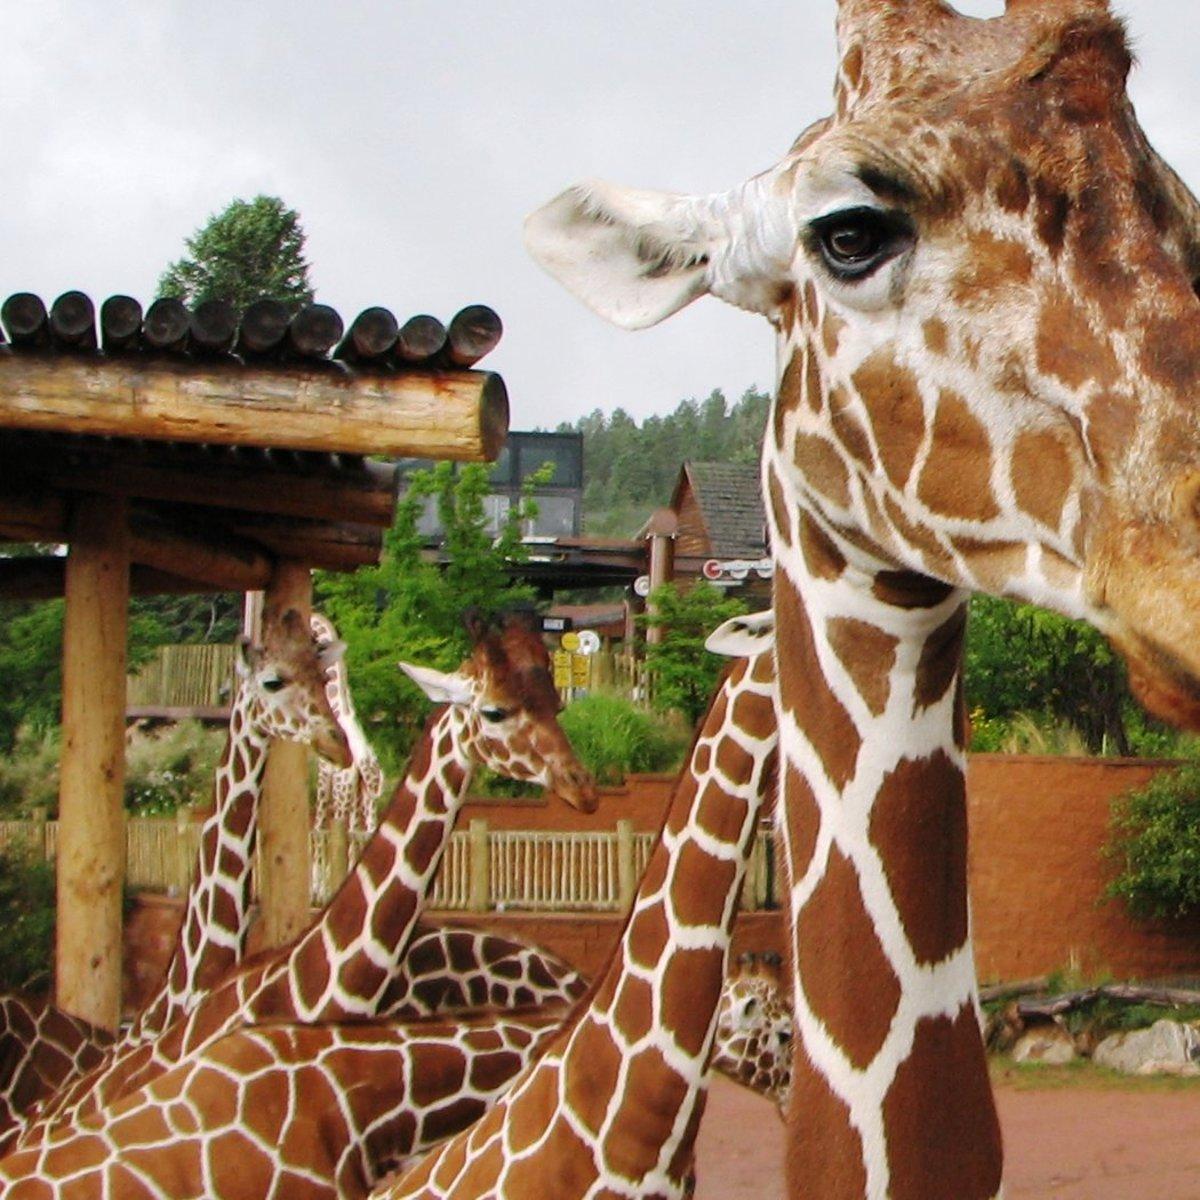 Giraffes at Cheyenne Mountain Zoo in Colorado Springs, Colorado